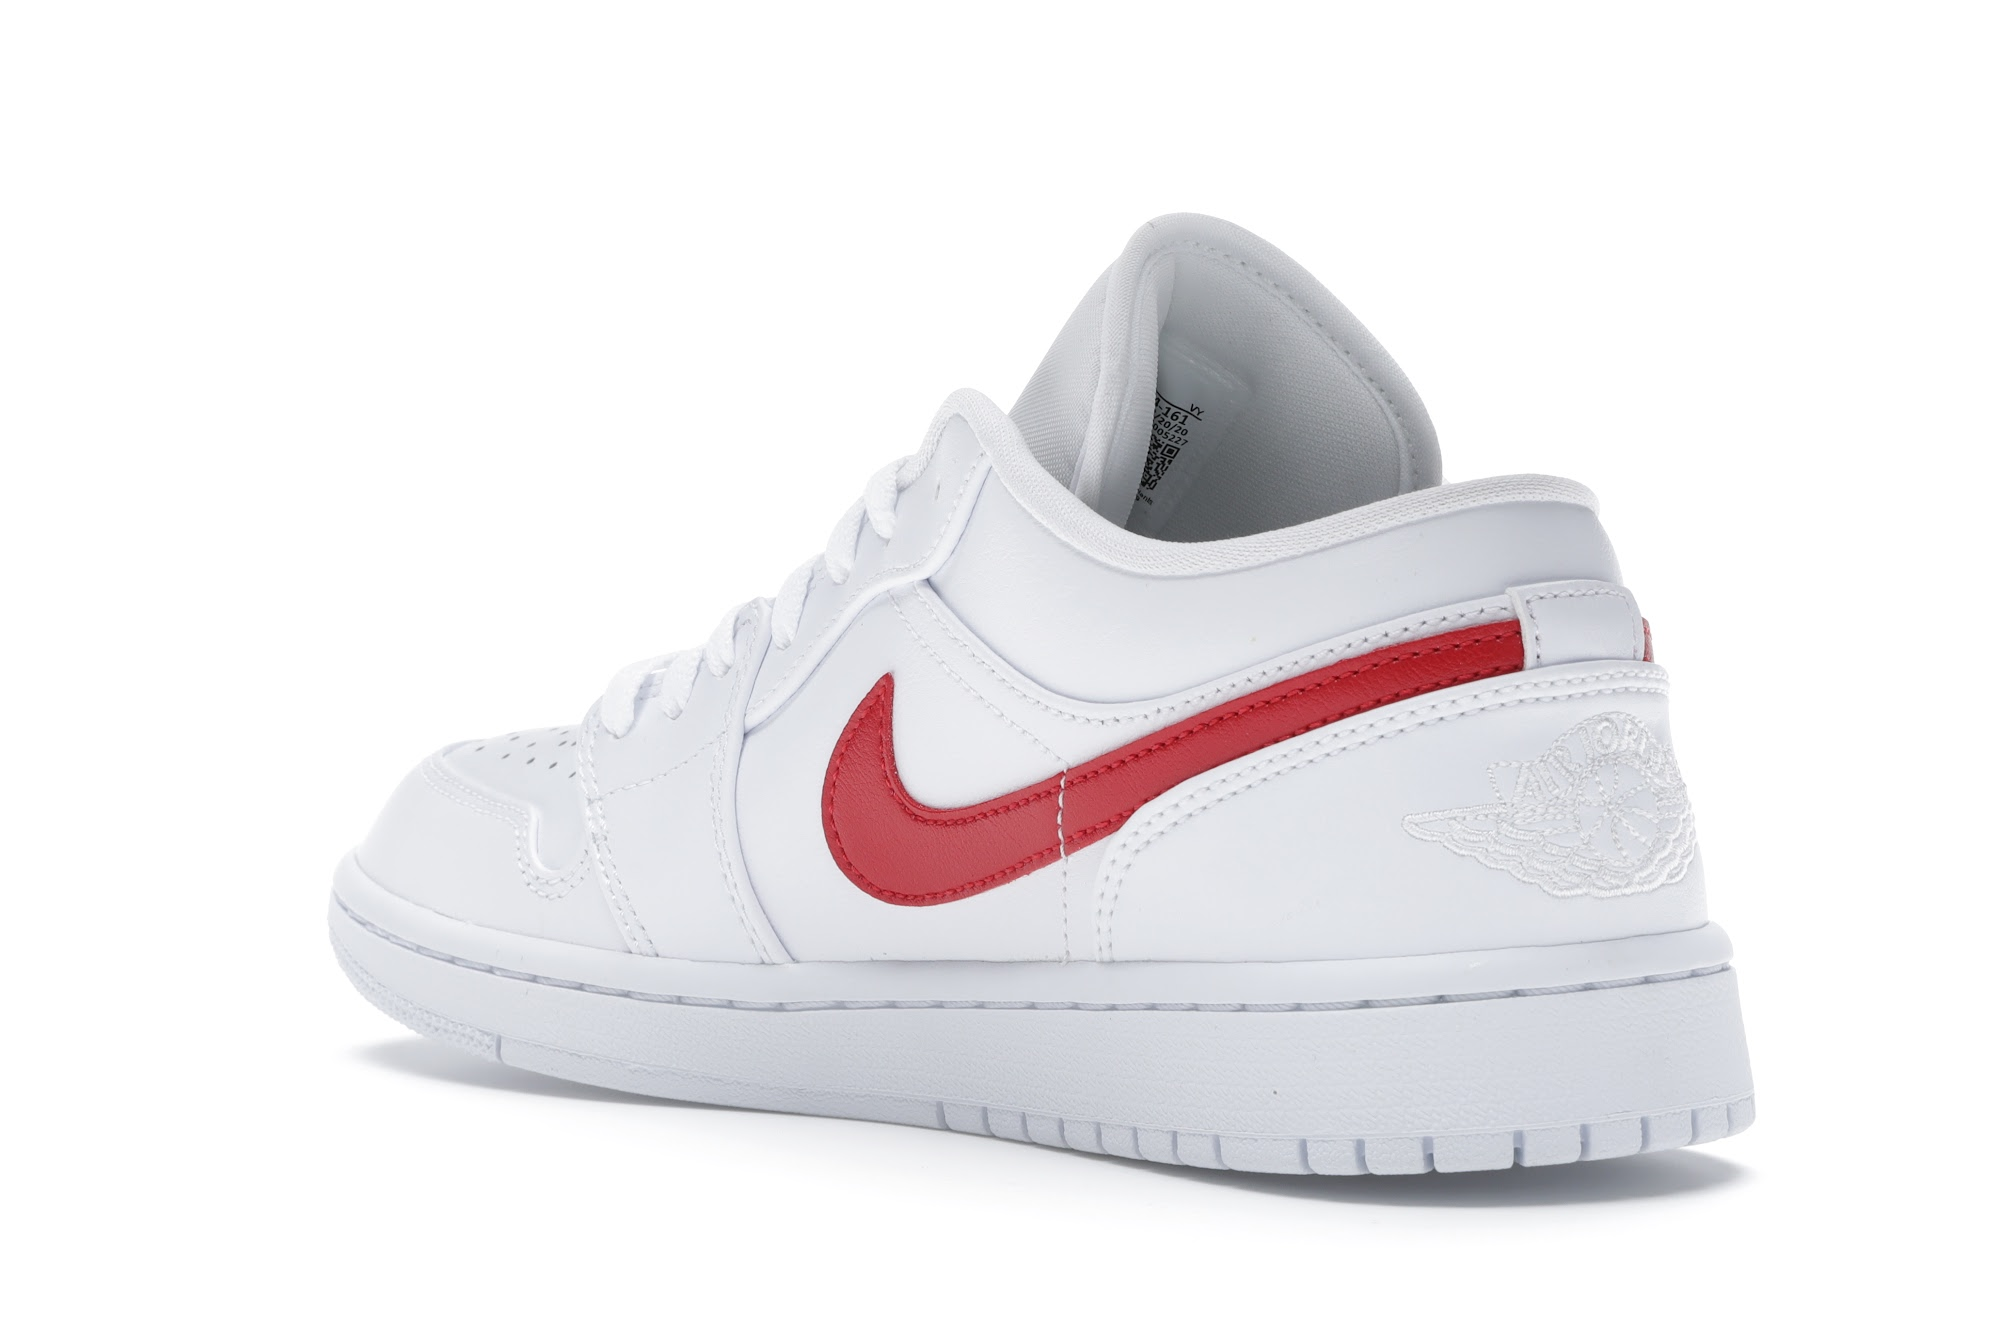 Jordan 1 Low White University Red (W) - AO9944-161